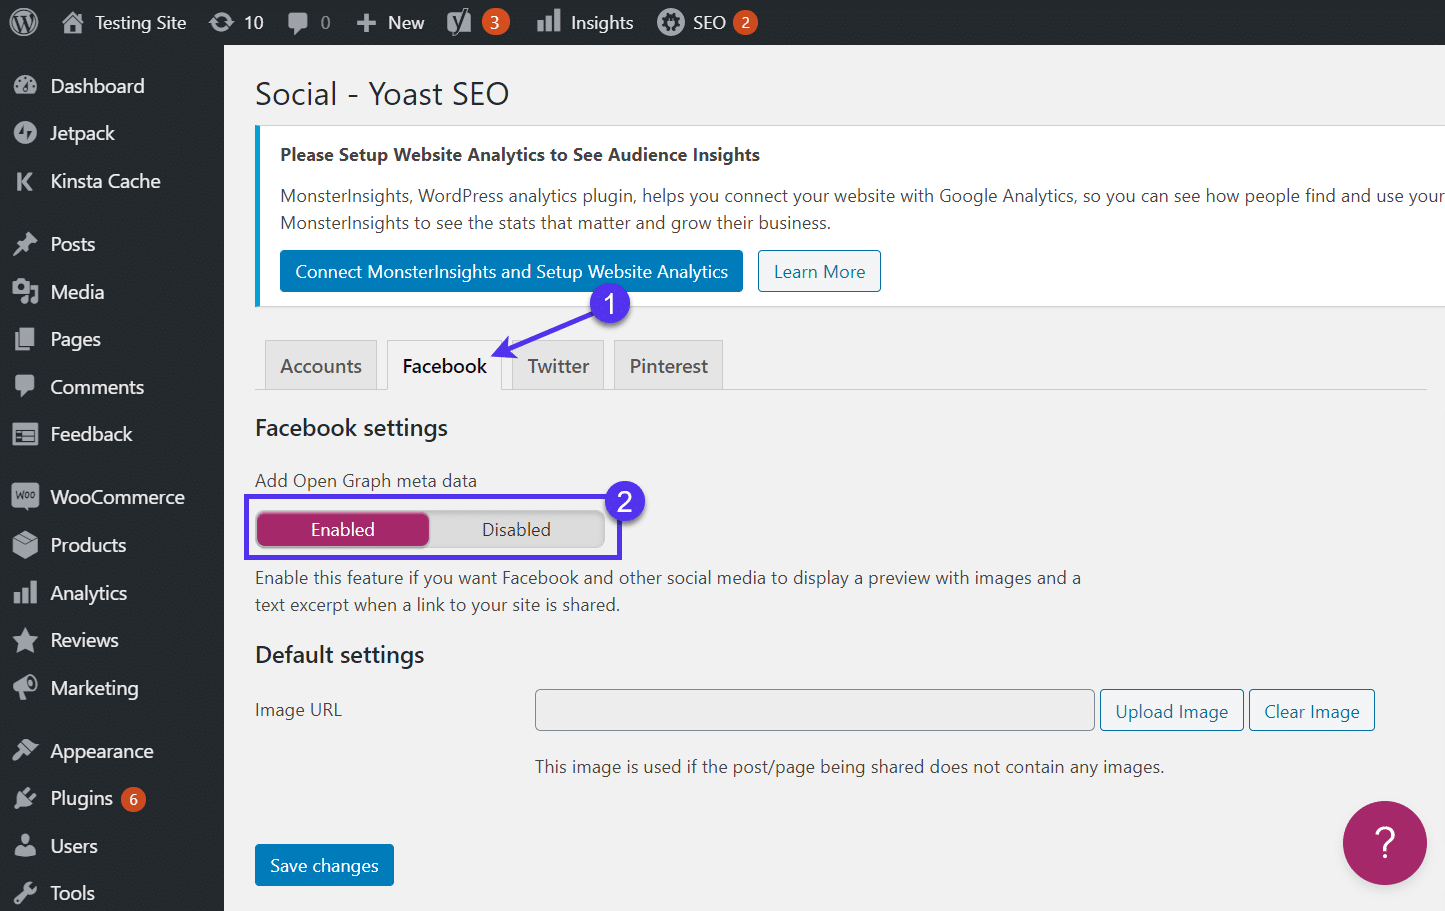 Facebook tab - WordPress featured image not showing